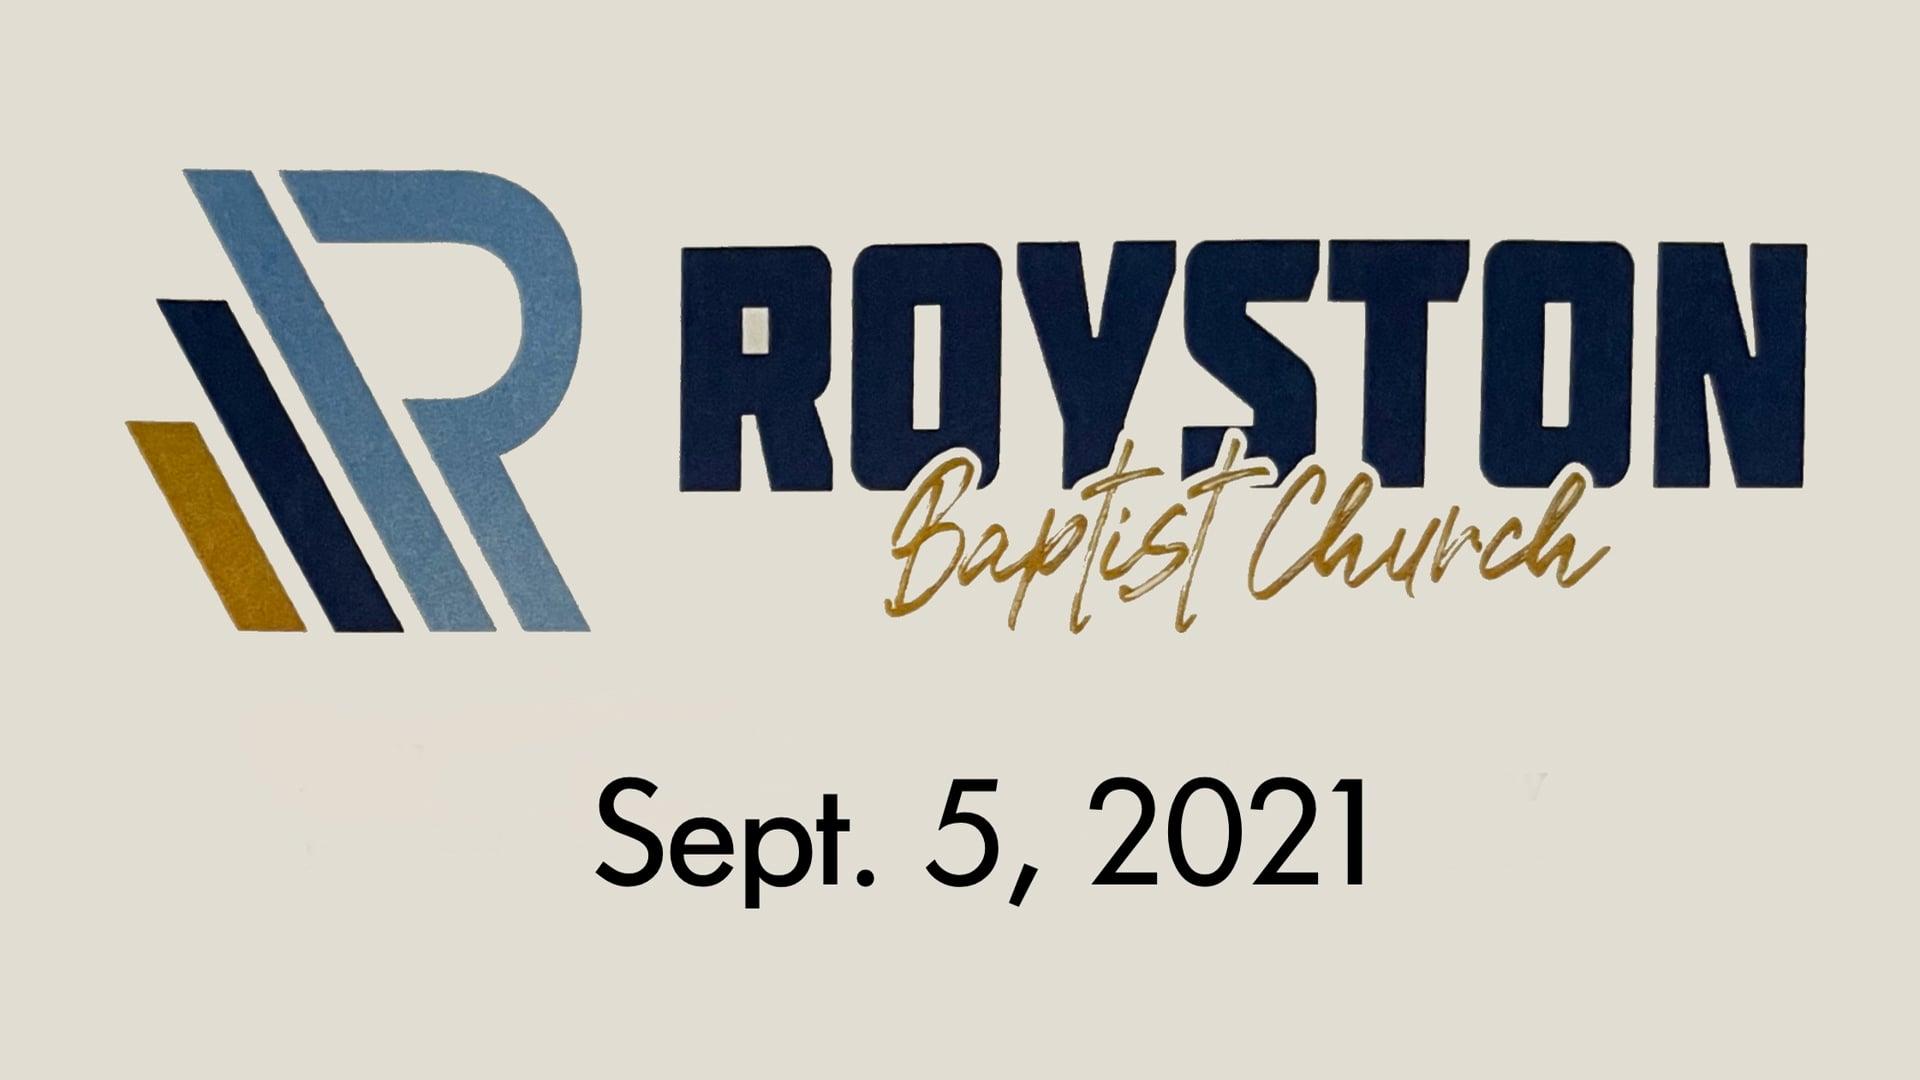 Royston Baptist Church 11 AM Worship Service Message for Sept. 5, 2021